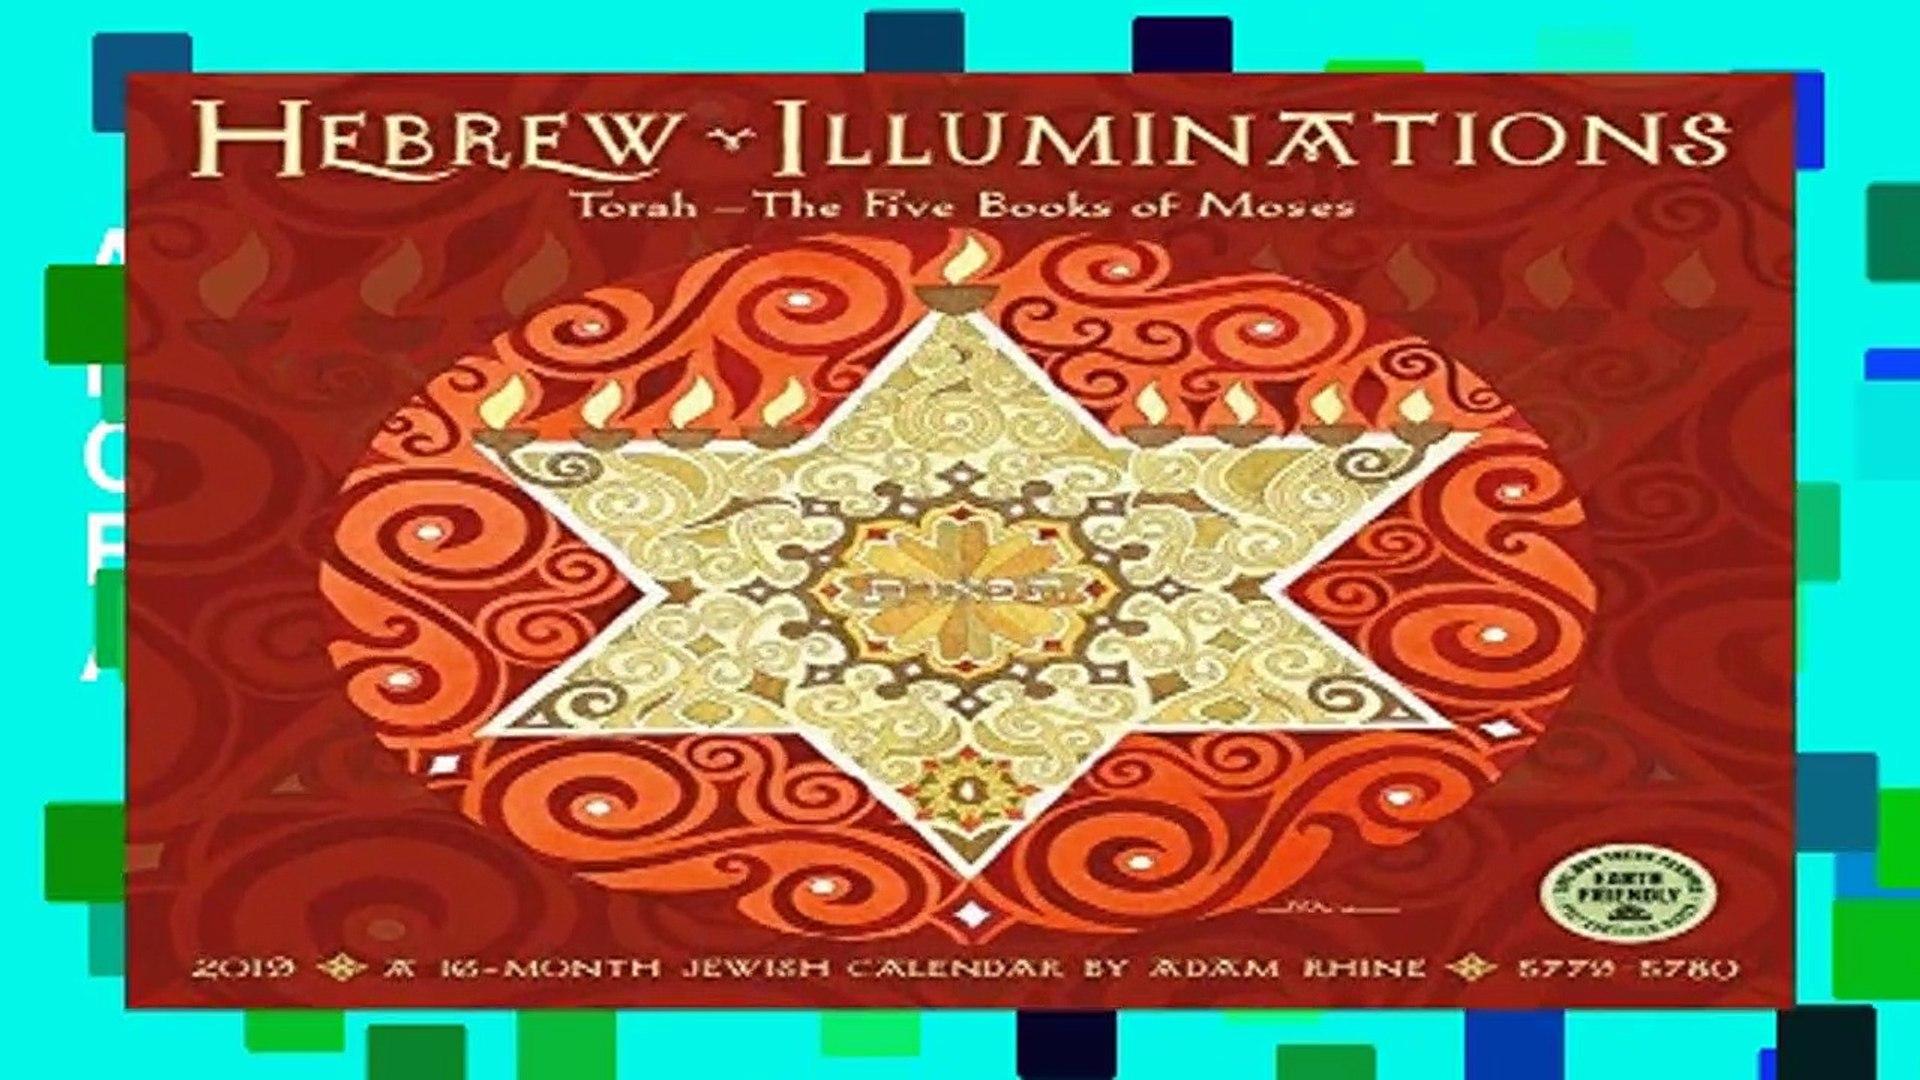 Torah Calendar.About For Book Hebrew Illuminations 2019 Calendar Torah The Five Books Of Moses A Jewish